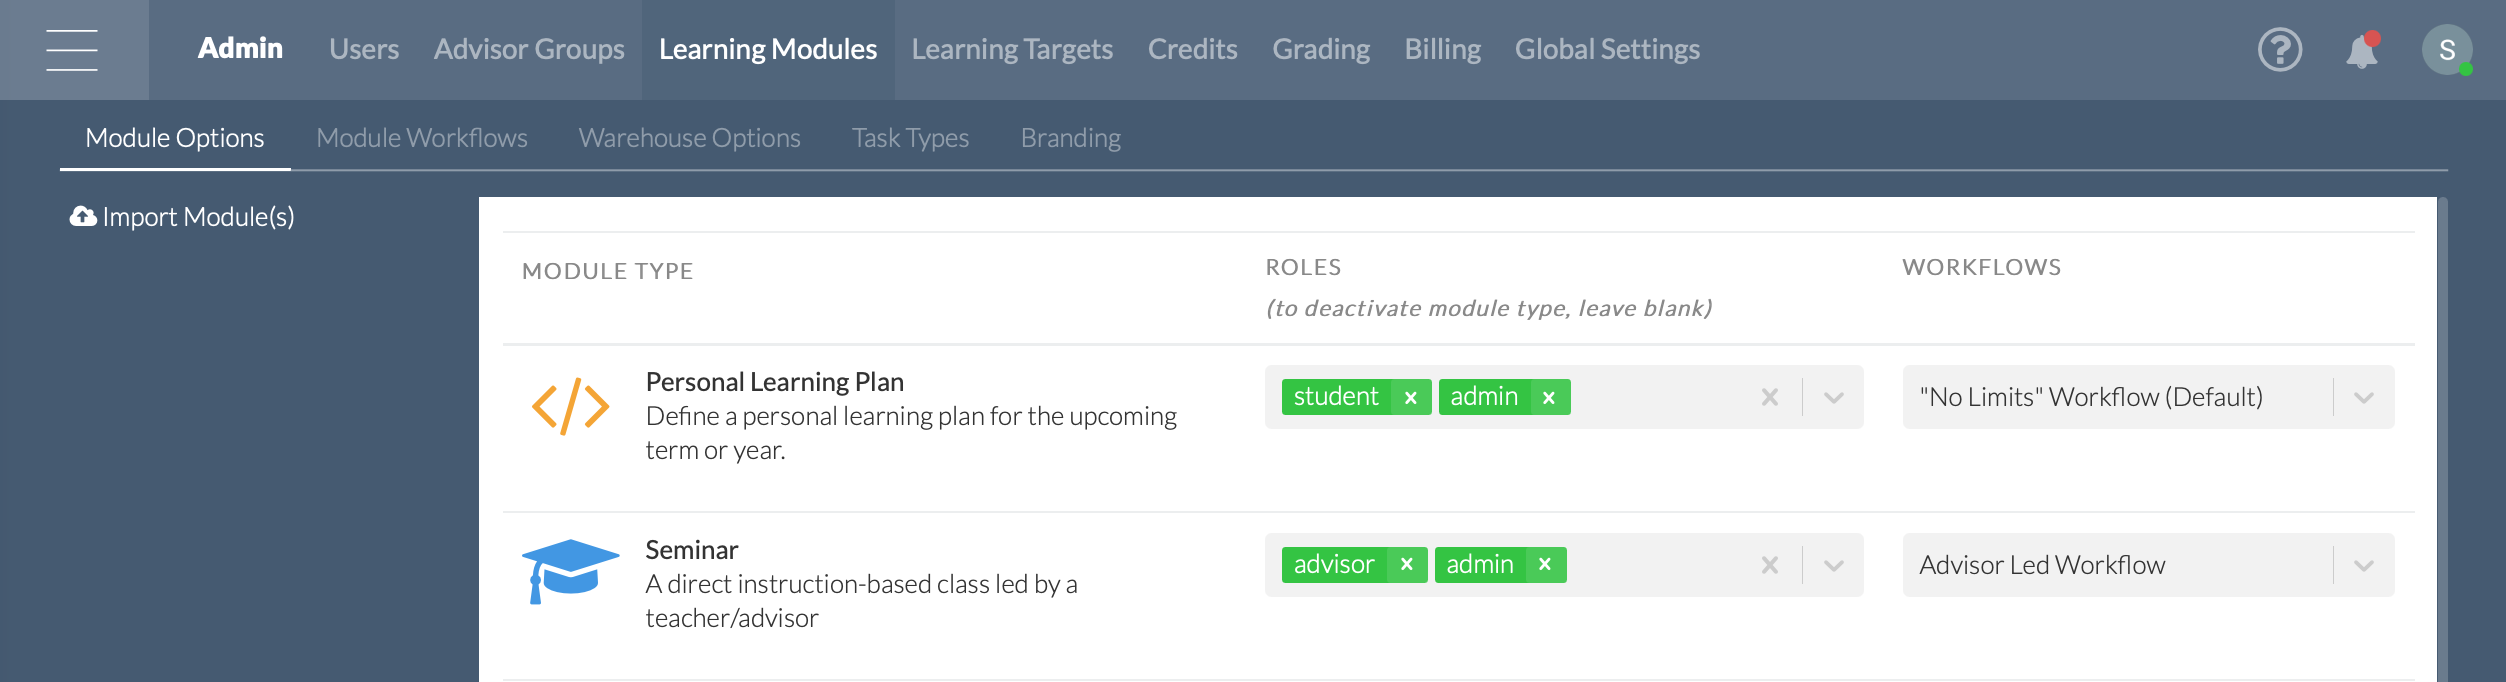 ADMIN > Learning Modules > Module Settings